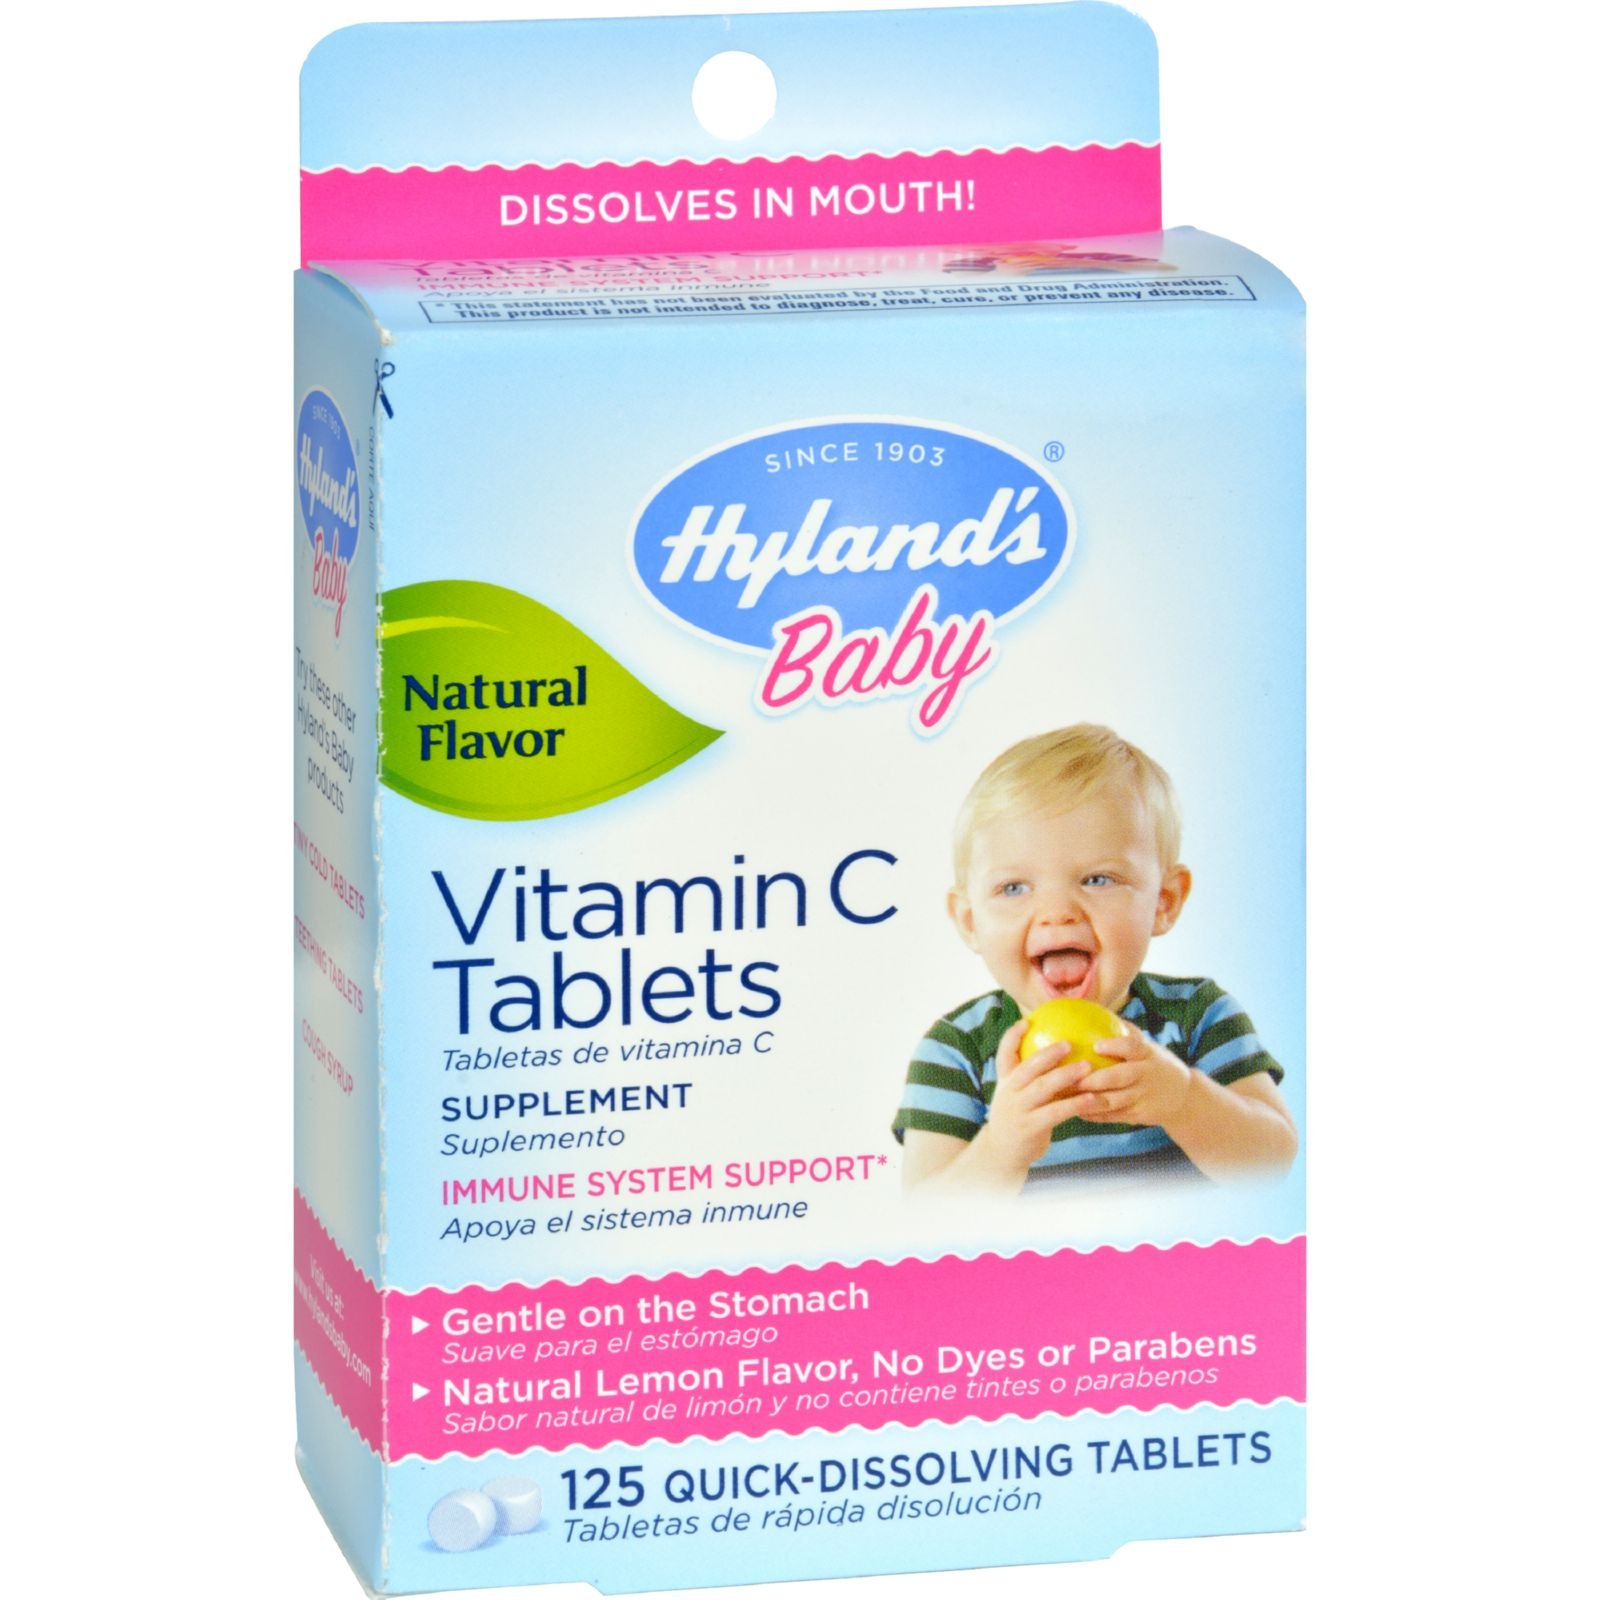 Hyland's Natural Lemon Flavored Vitamin C Tablets for Children - 25 mg - 125 Tablets - 100% Natural - Soft Tablets Dissolve Instantly